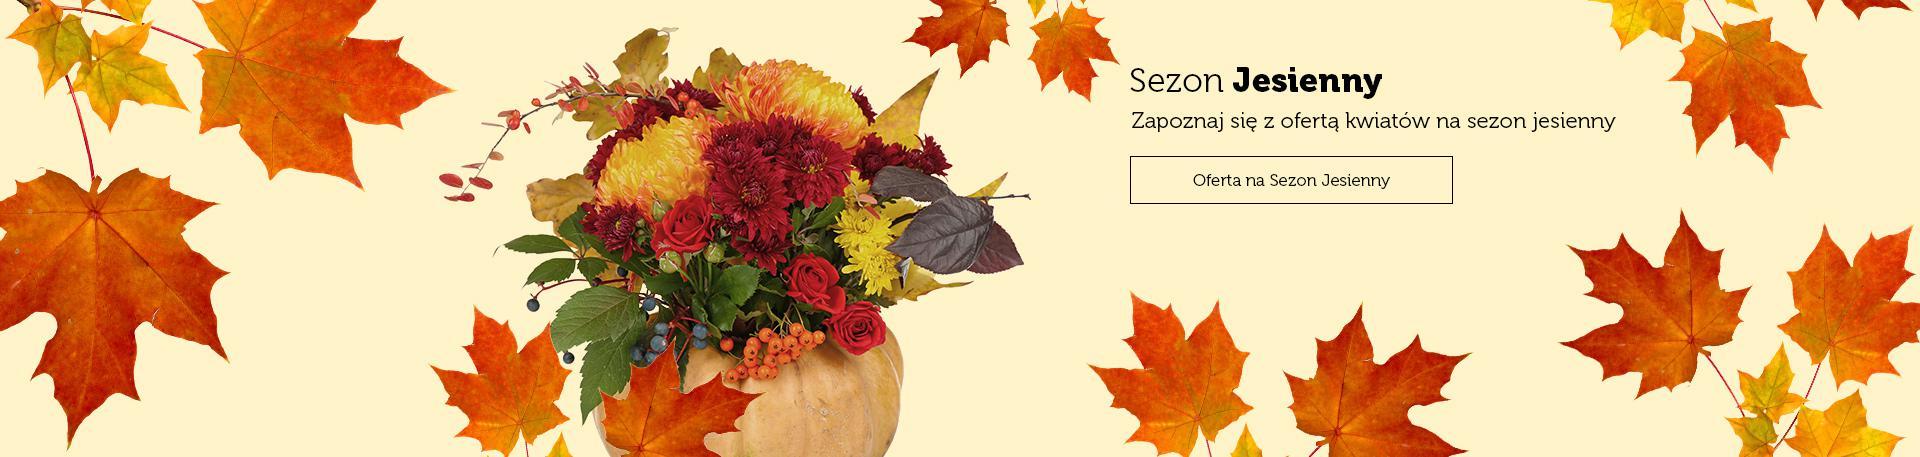 Oferta na Sezon Jesienny